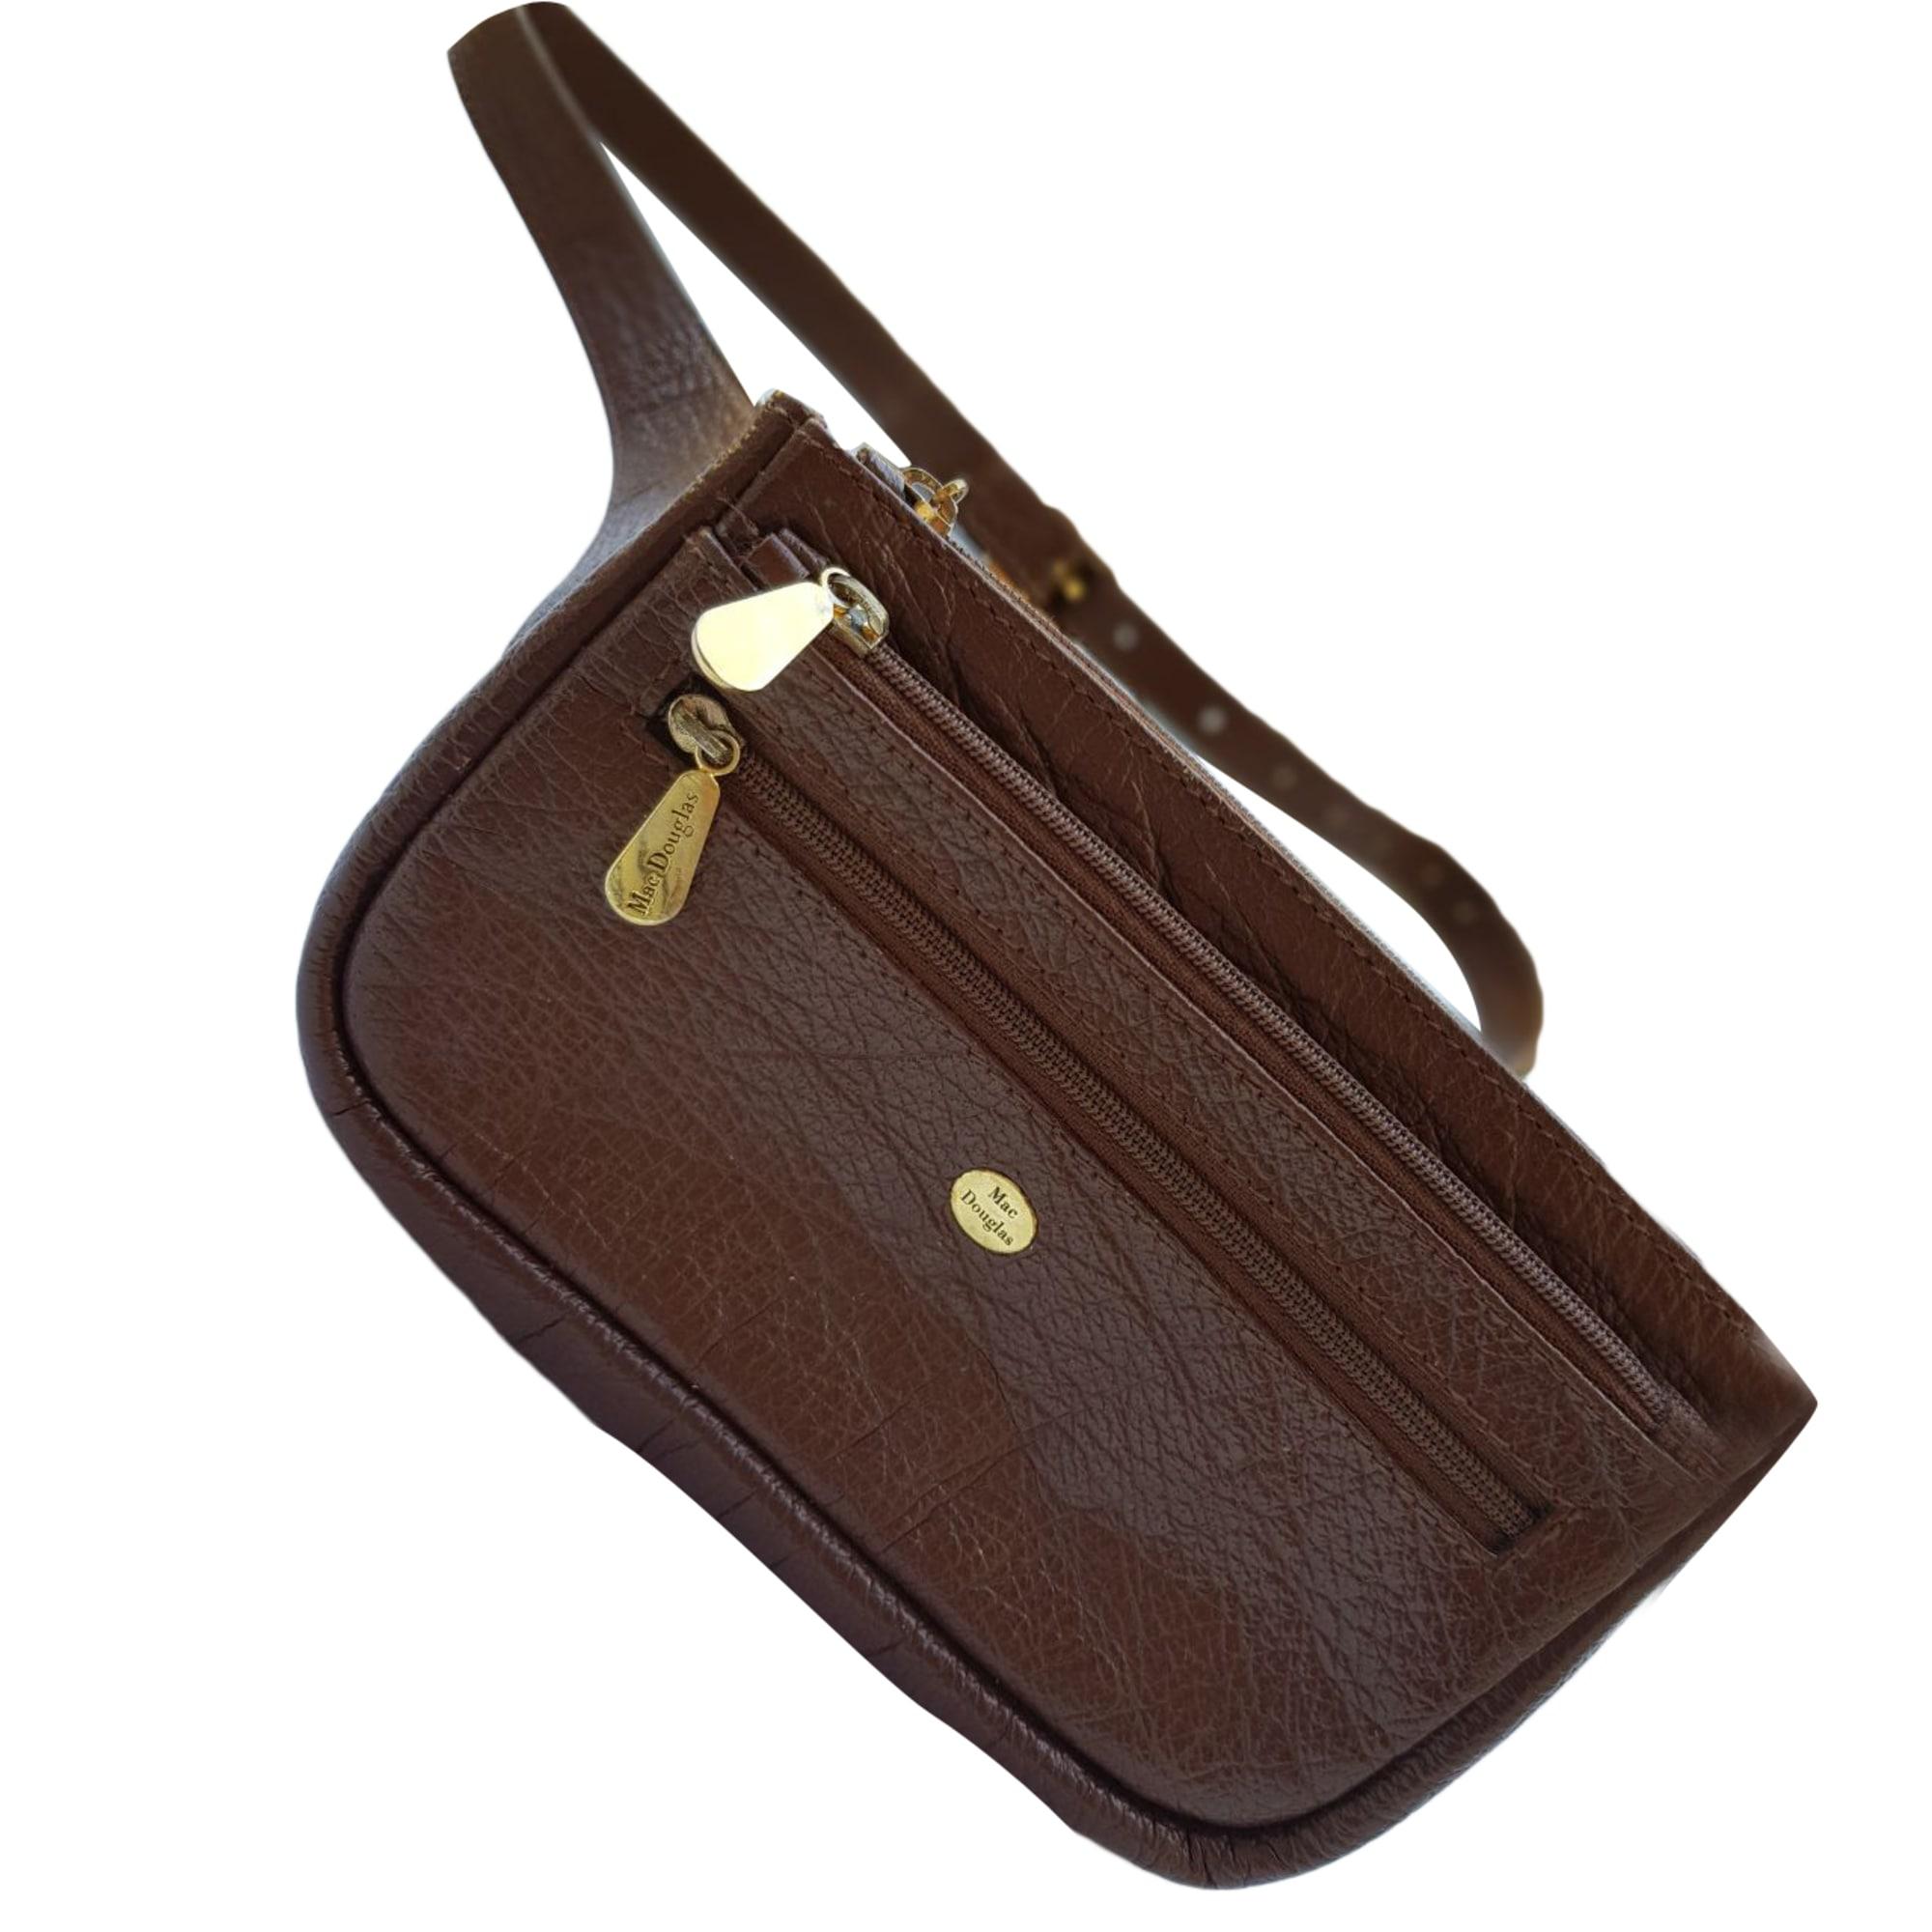 2498104e20ce Sac en bandoulière en cuir MAC DOUGLAS marron - 7891748